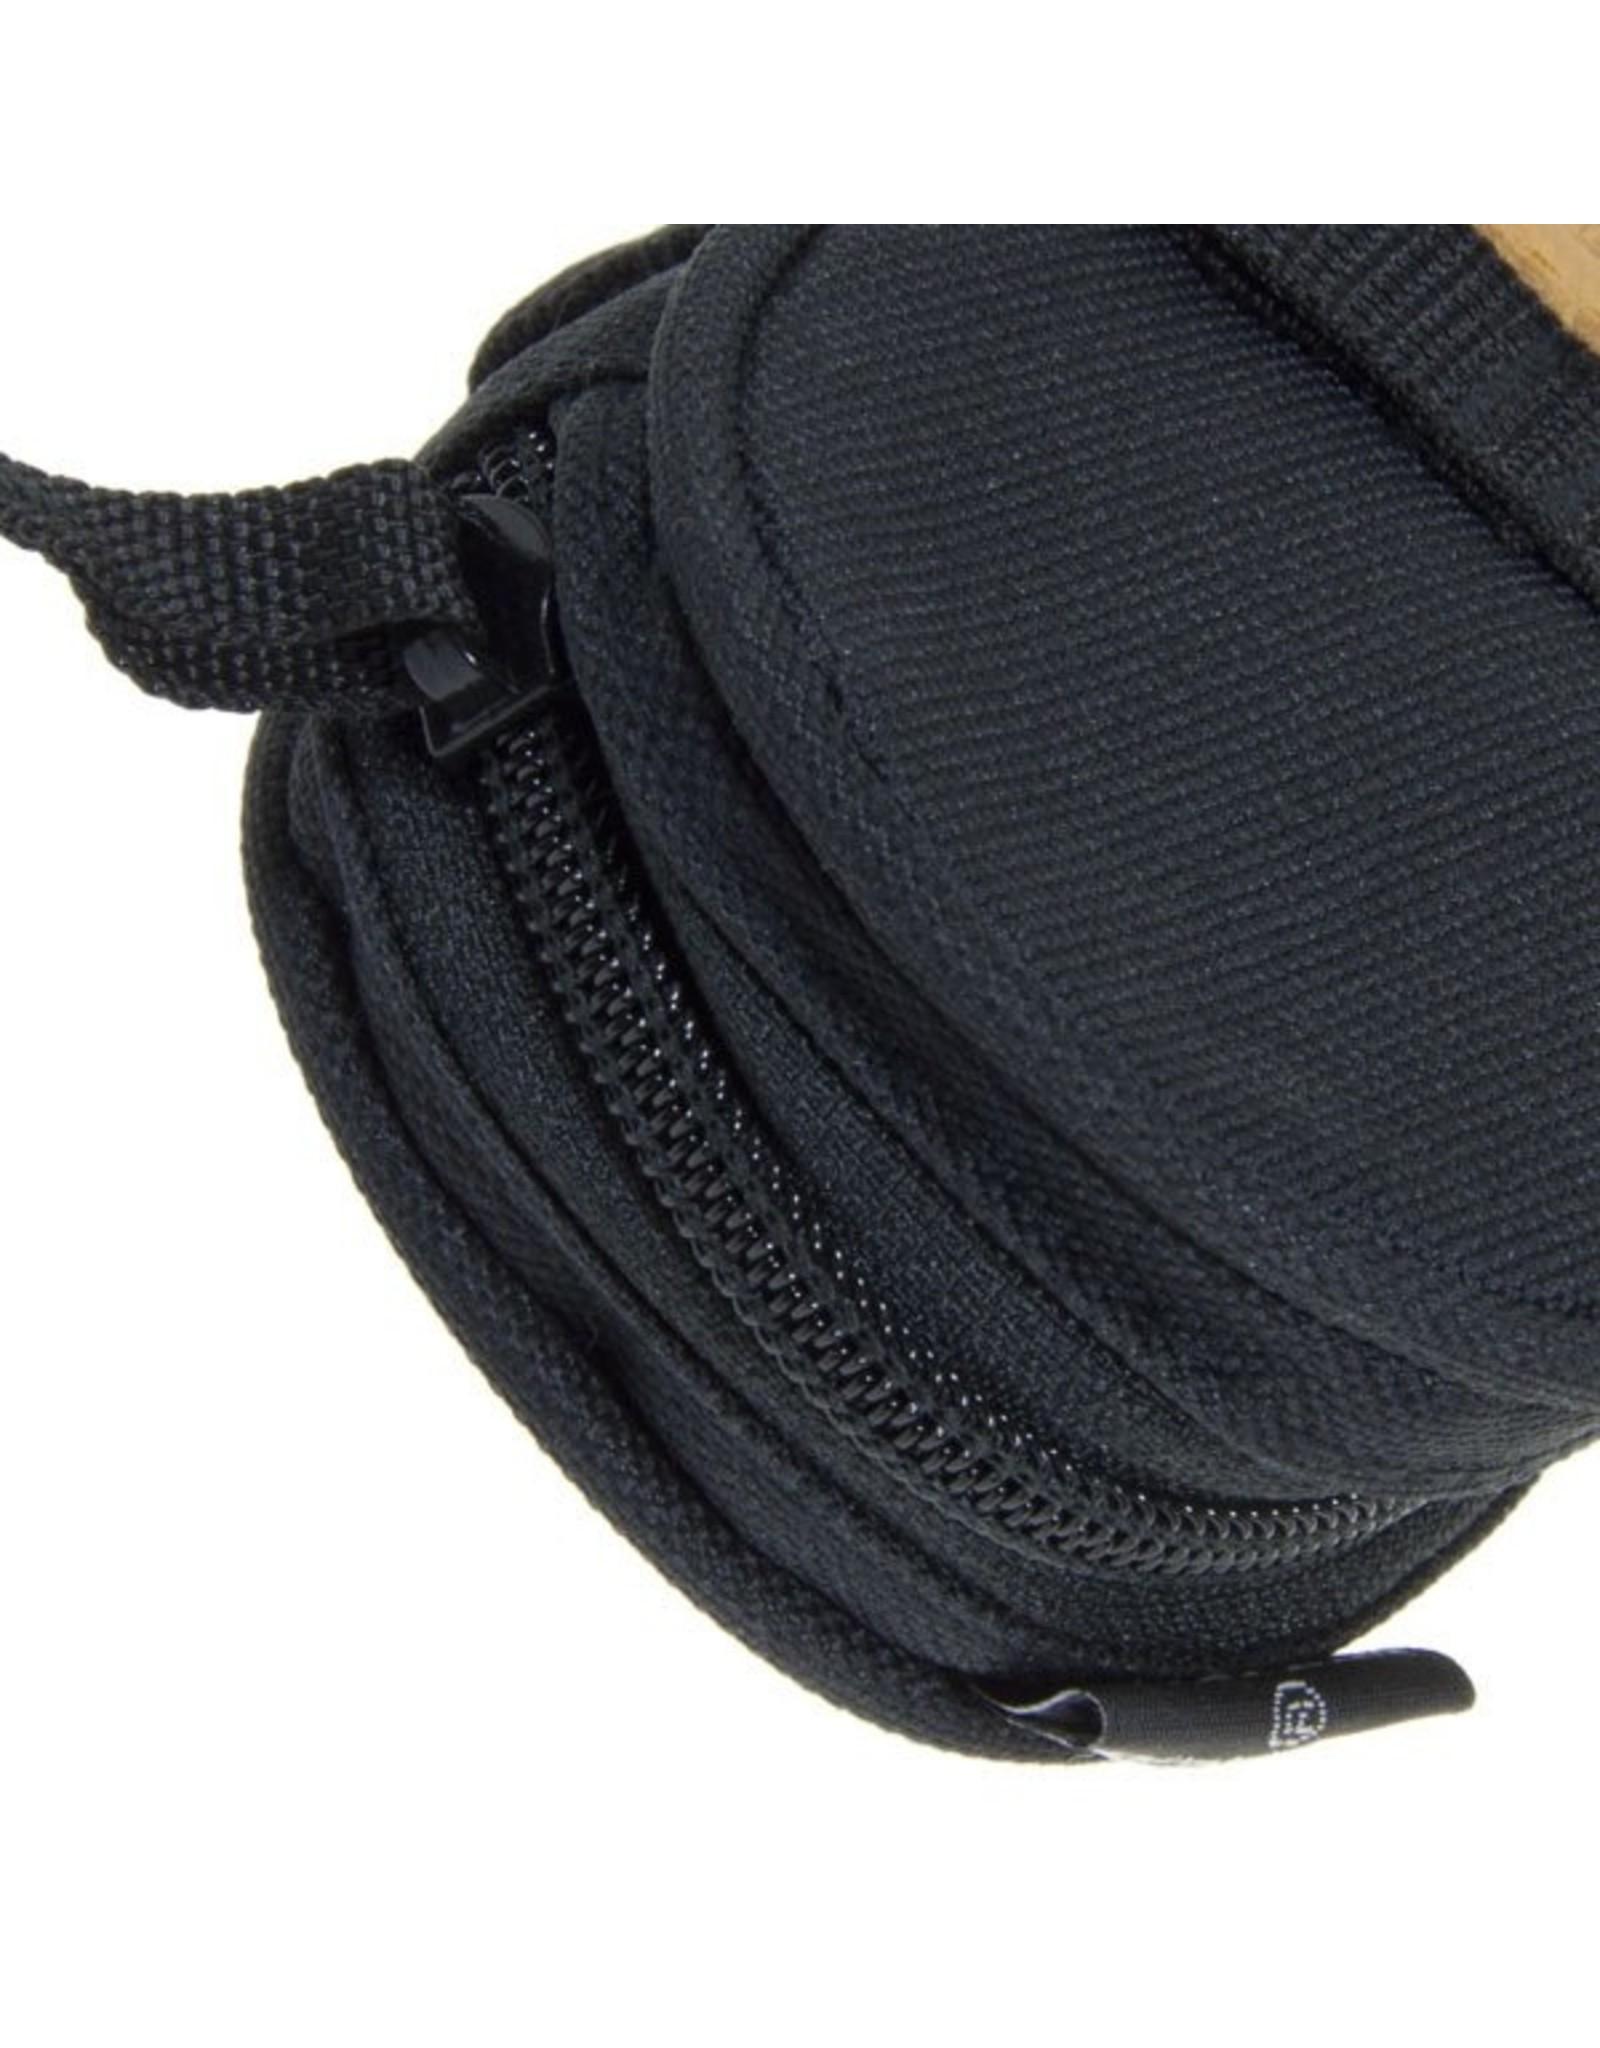 Arundel Arundel Uno Seat Bag